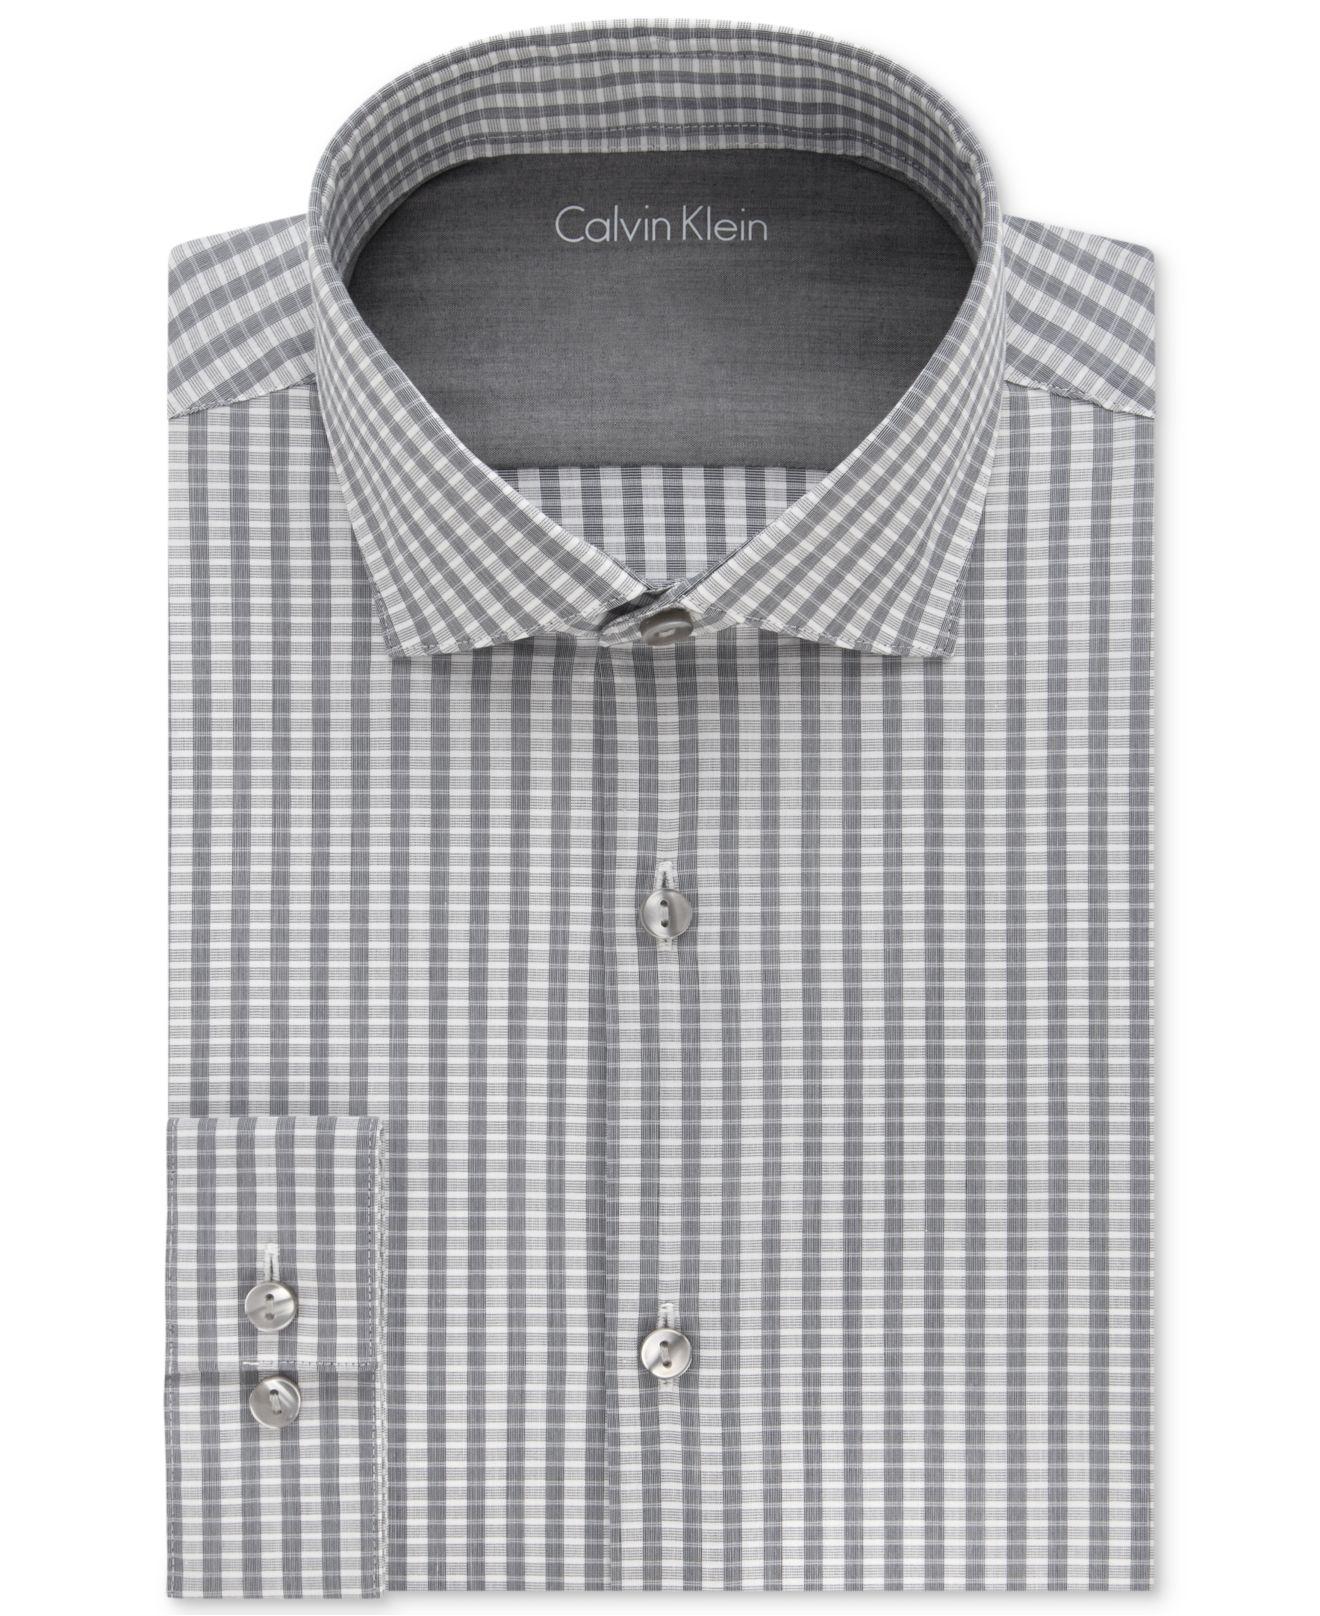 Calvin klein men 39 s x extra slim fit graphite striped dress for Calvin klein x fit dress shirt